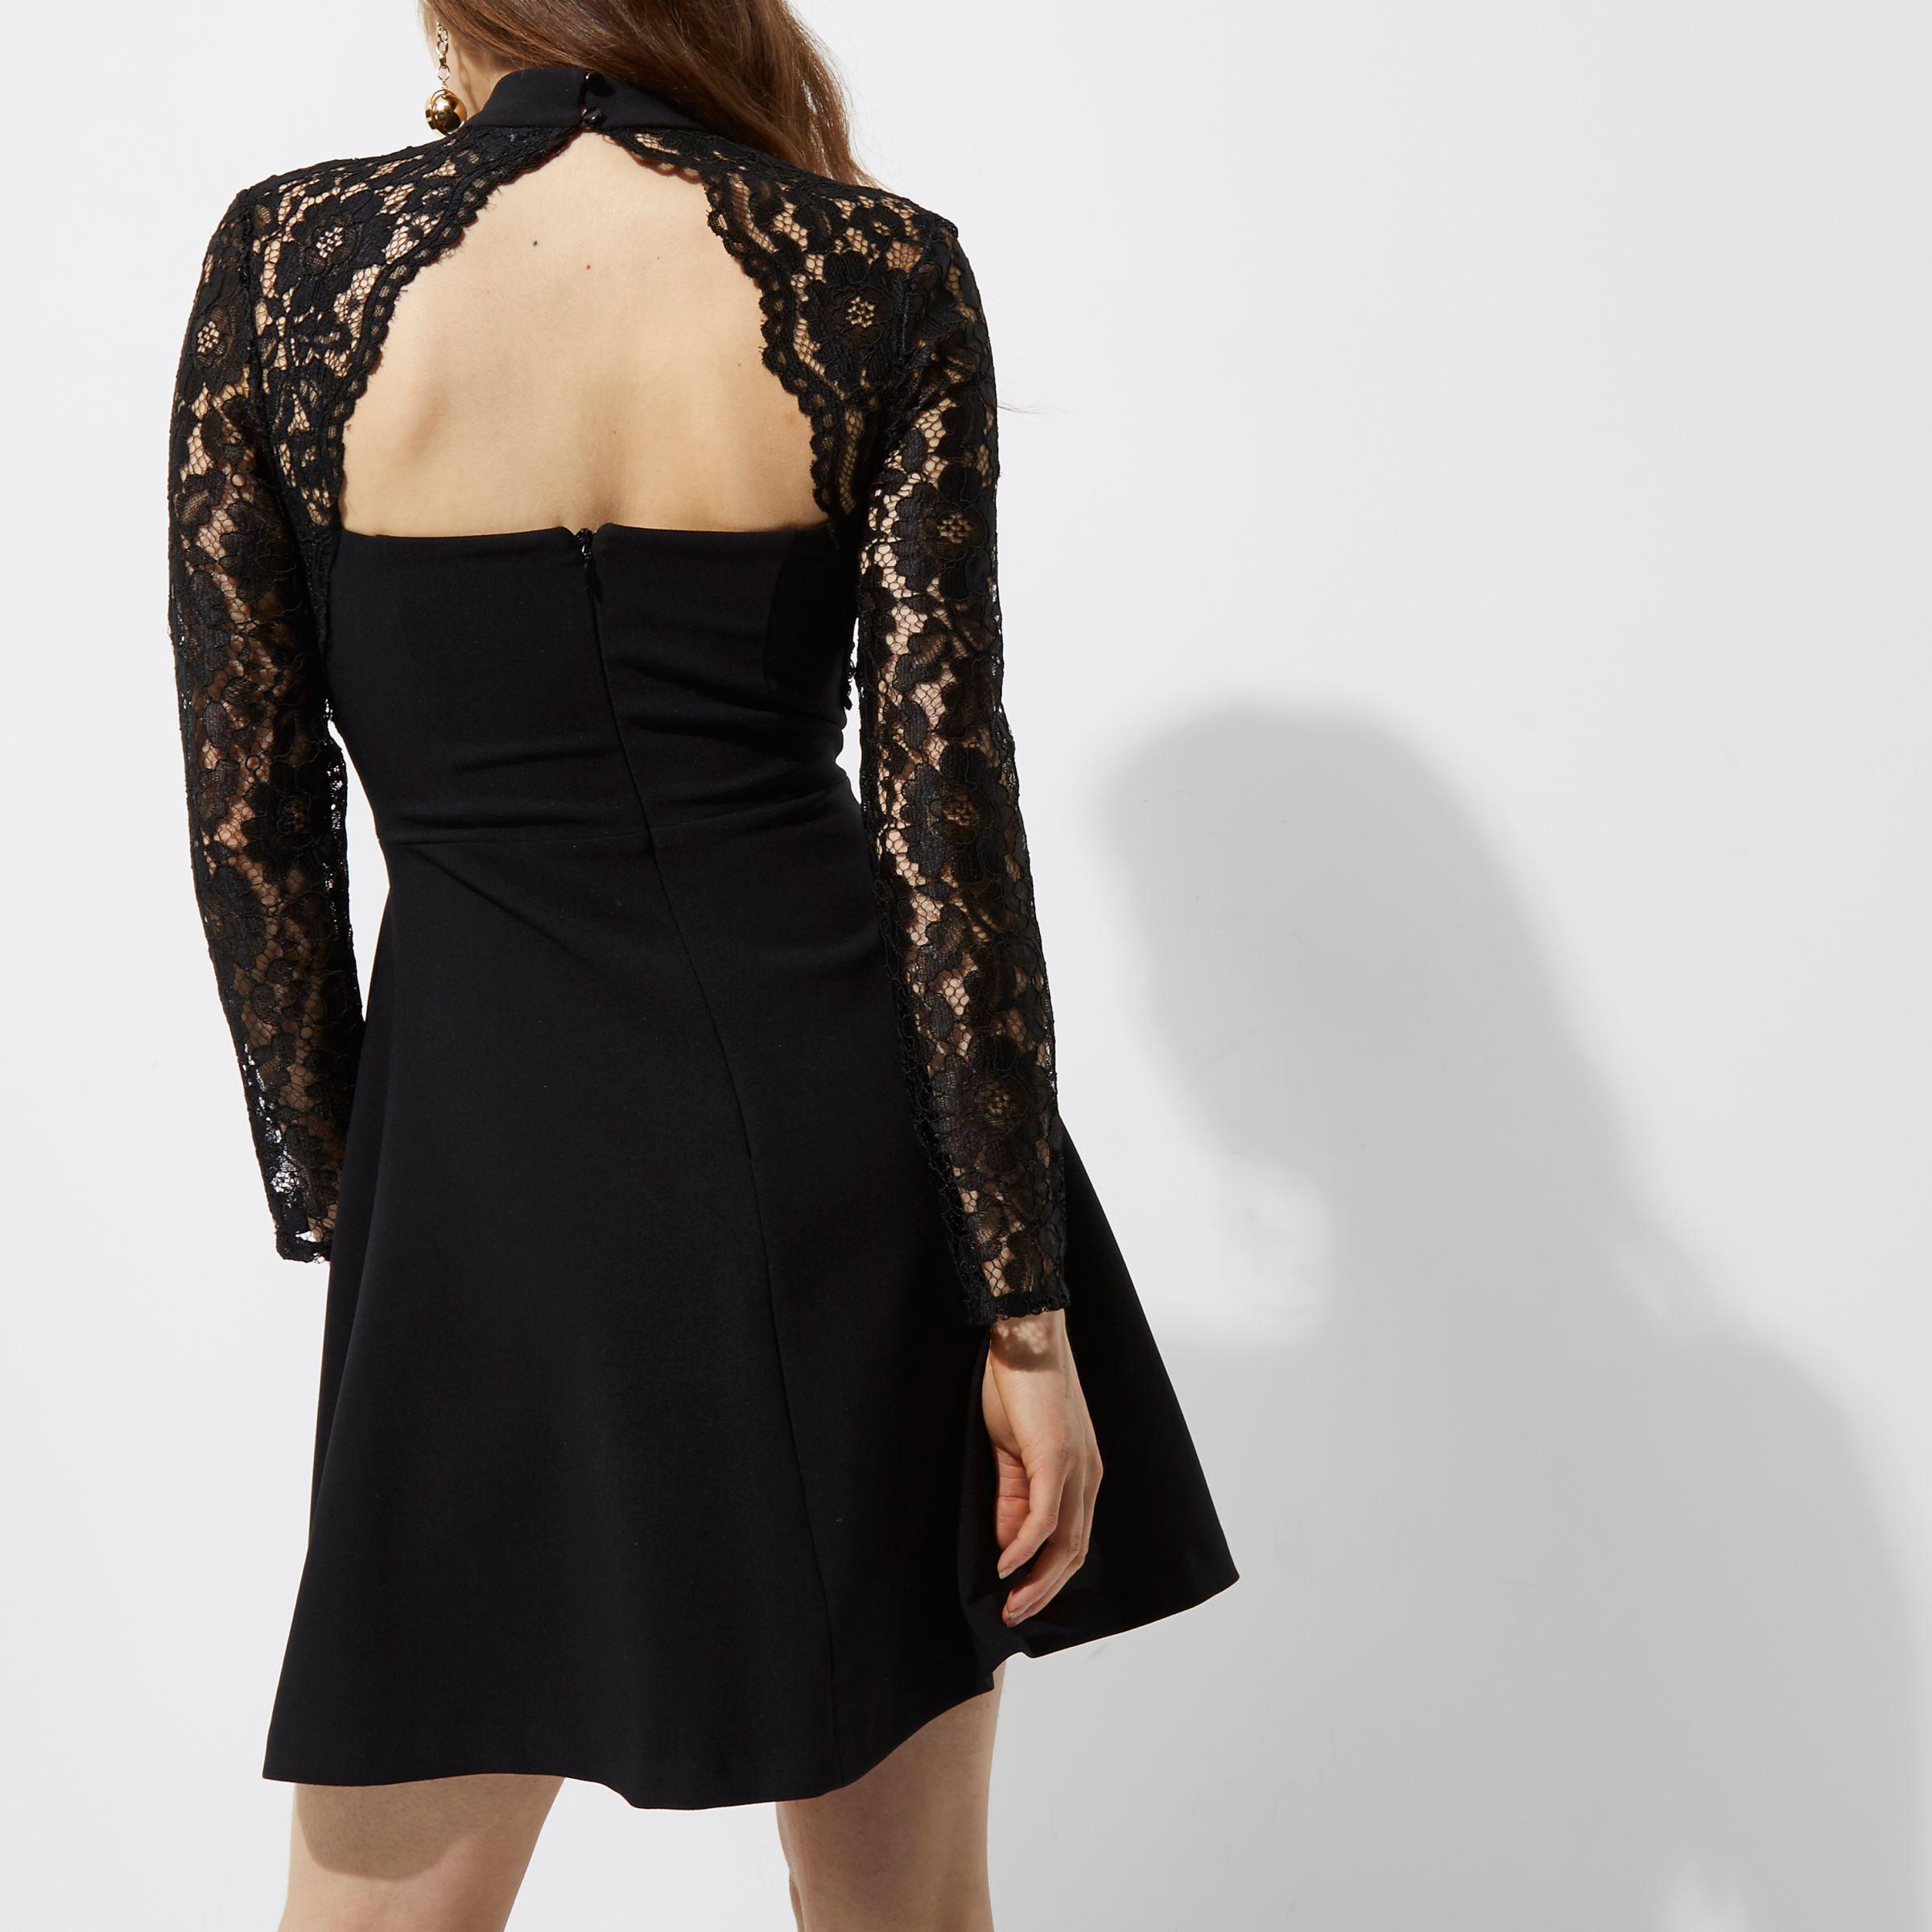 b8fe9d4516 Lyst - River Island Black Lace Long Sleeve Choker Skater Dress in Black